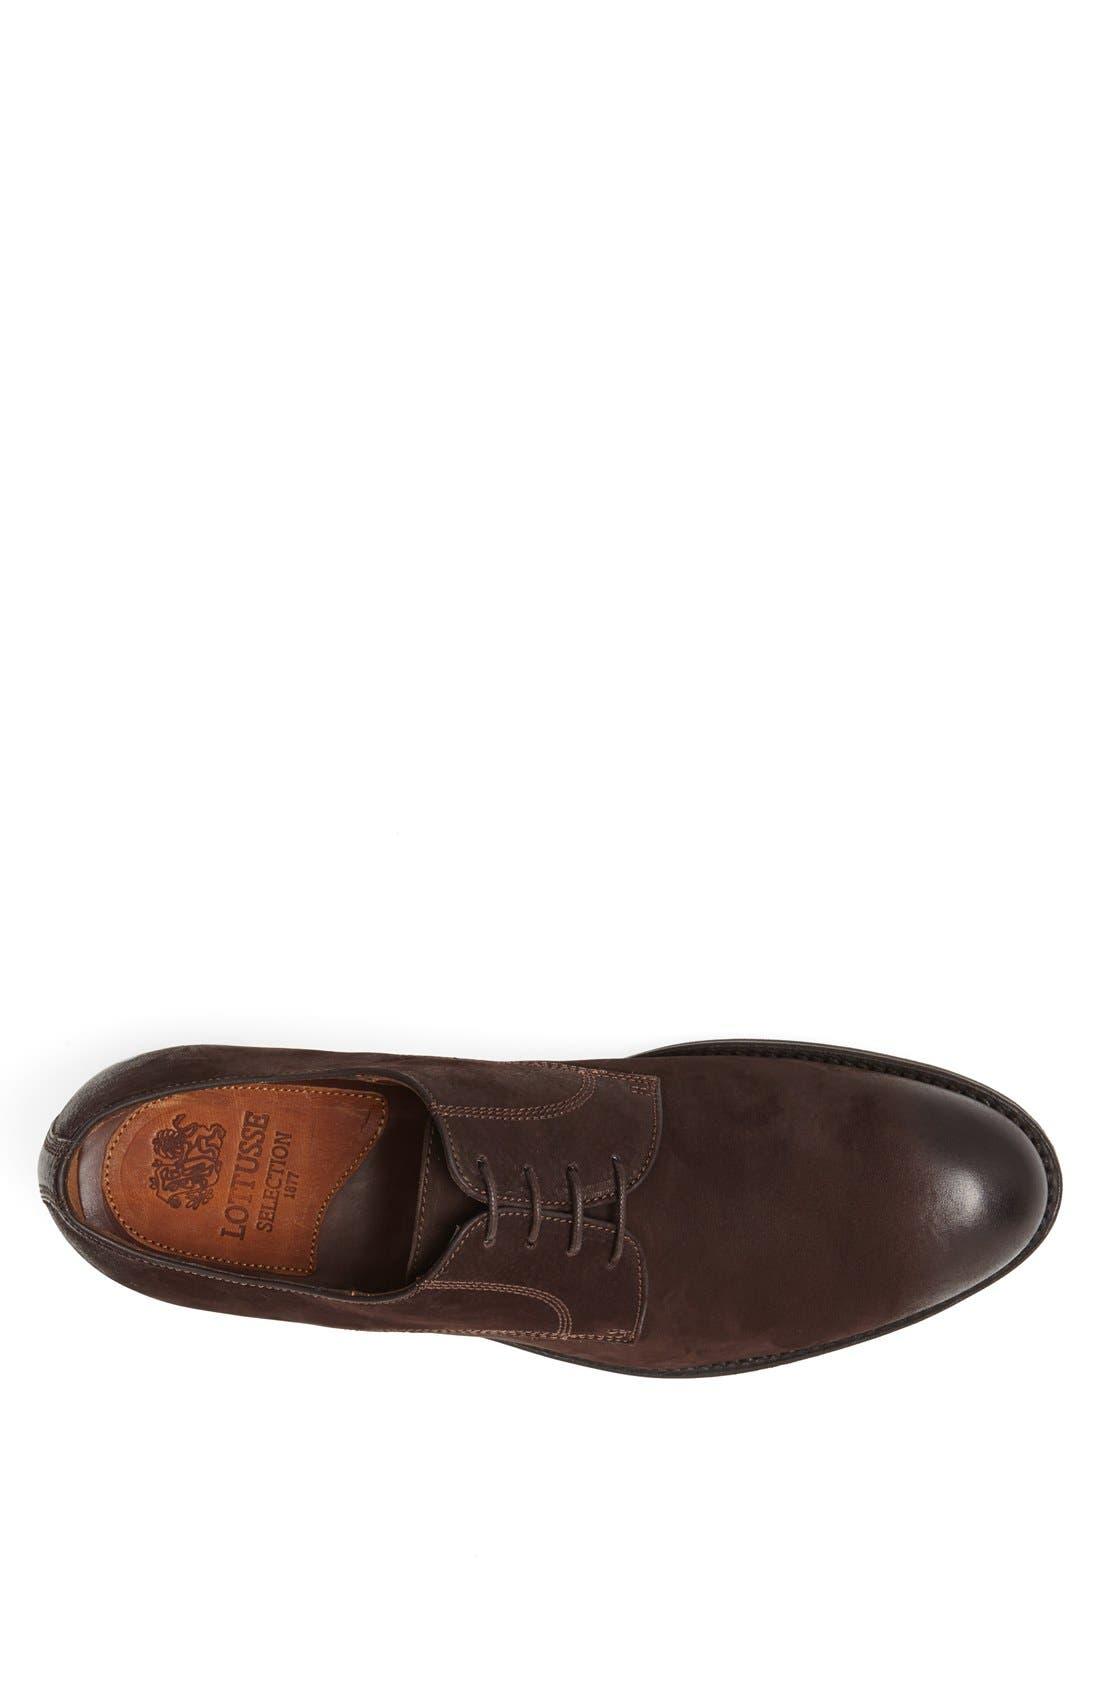 Alternate Image 3  - Lottusse Leather Plain Toe Derby